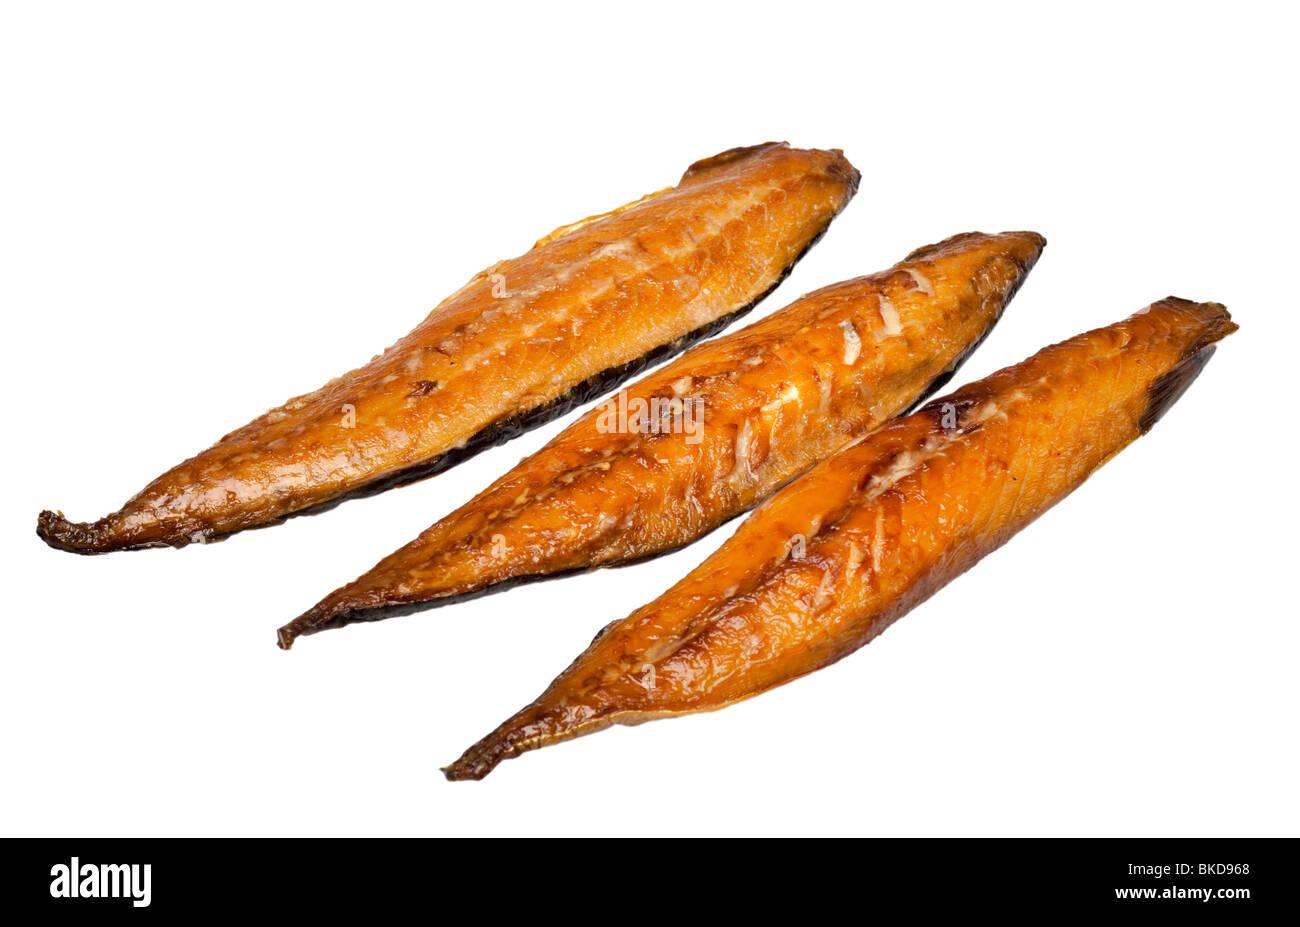 Smoked mackerel fillets on white - Stock Image